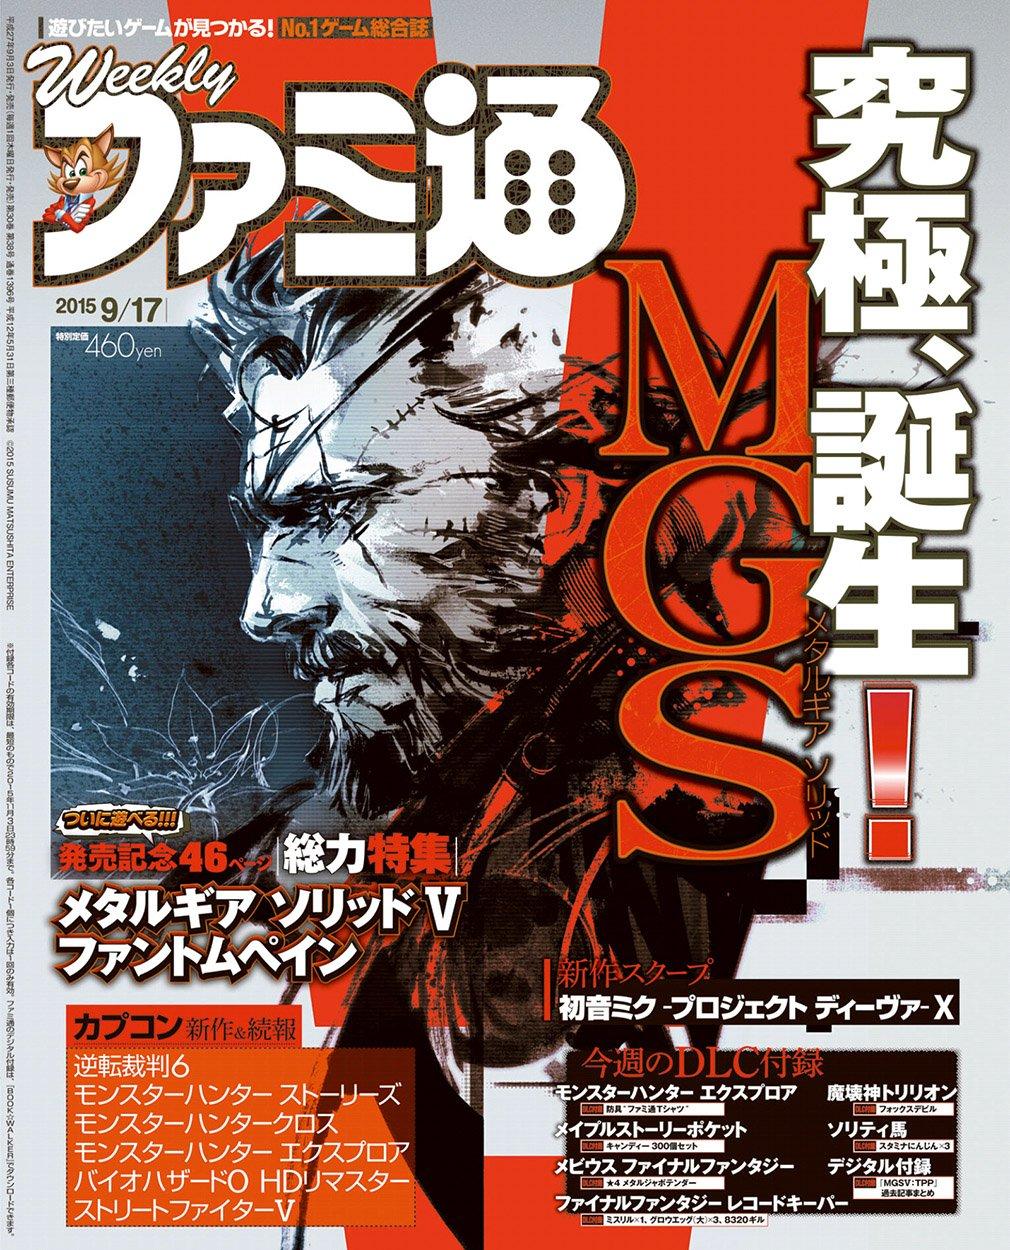 Famitsu 1396 September 17, 2015